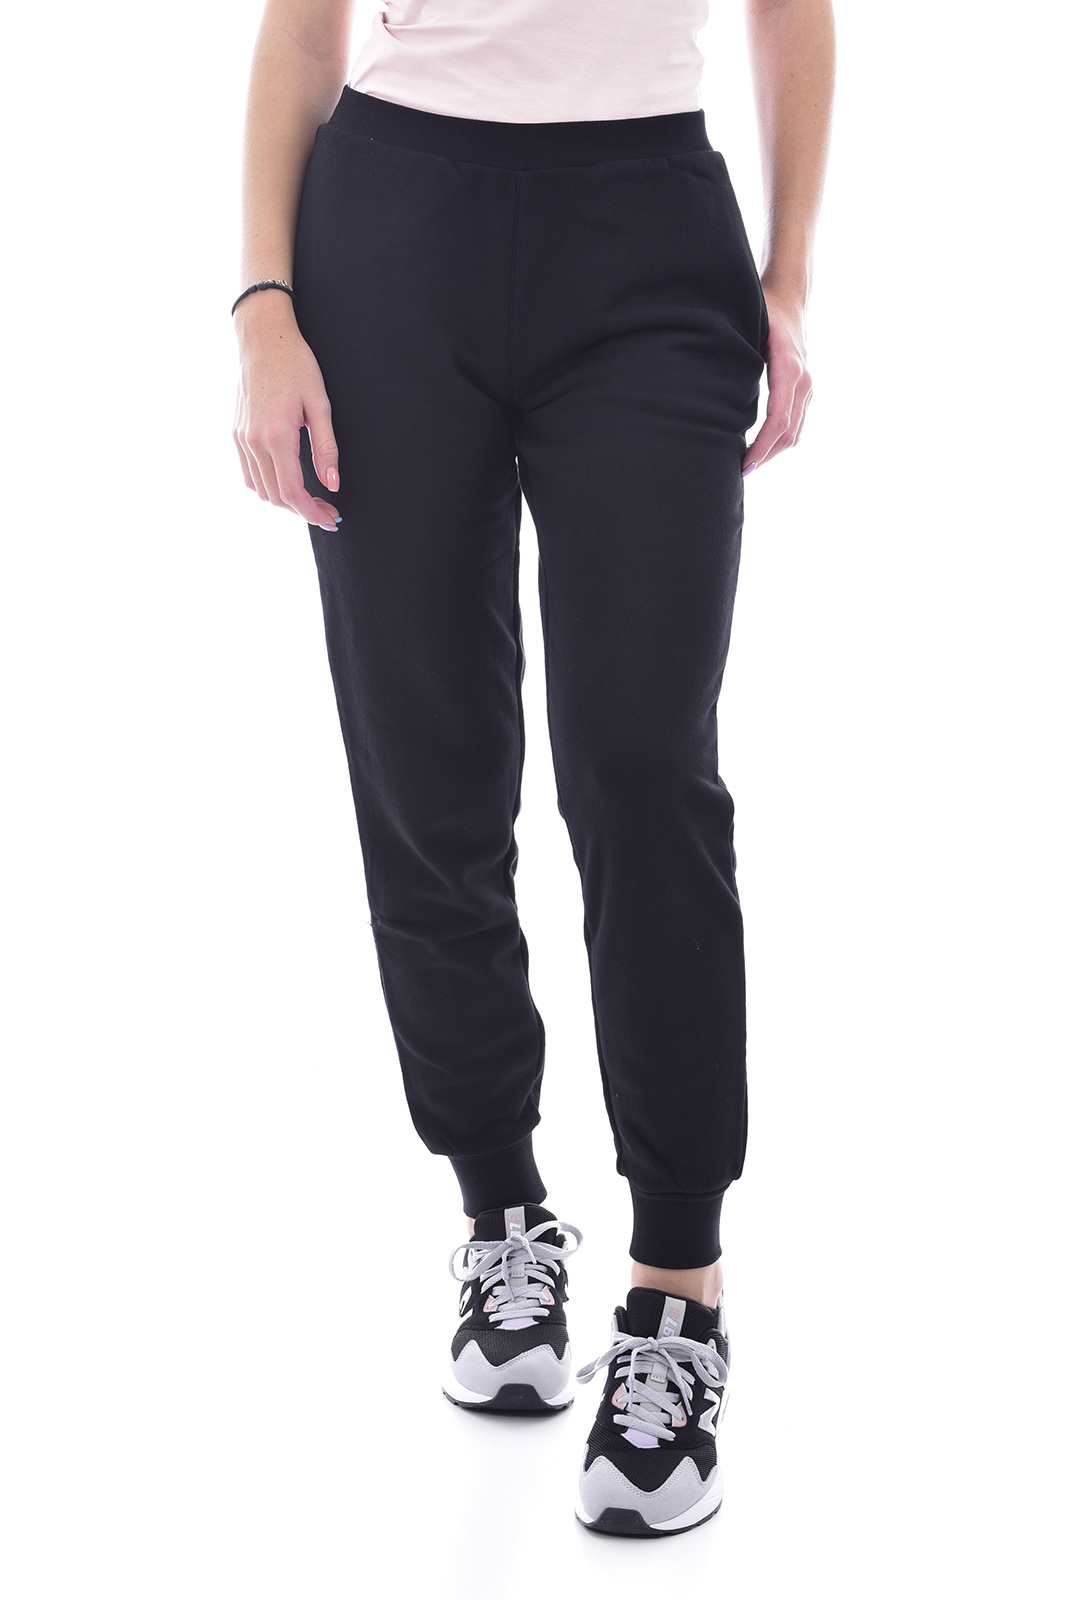 Pantalons  Emporio armani 163774 0A265 020 BLACK